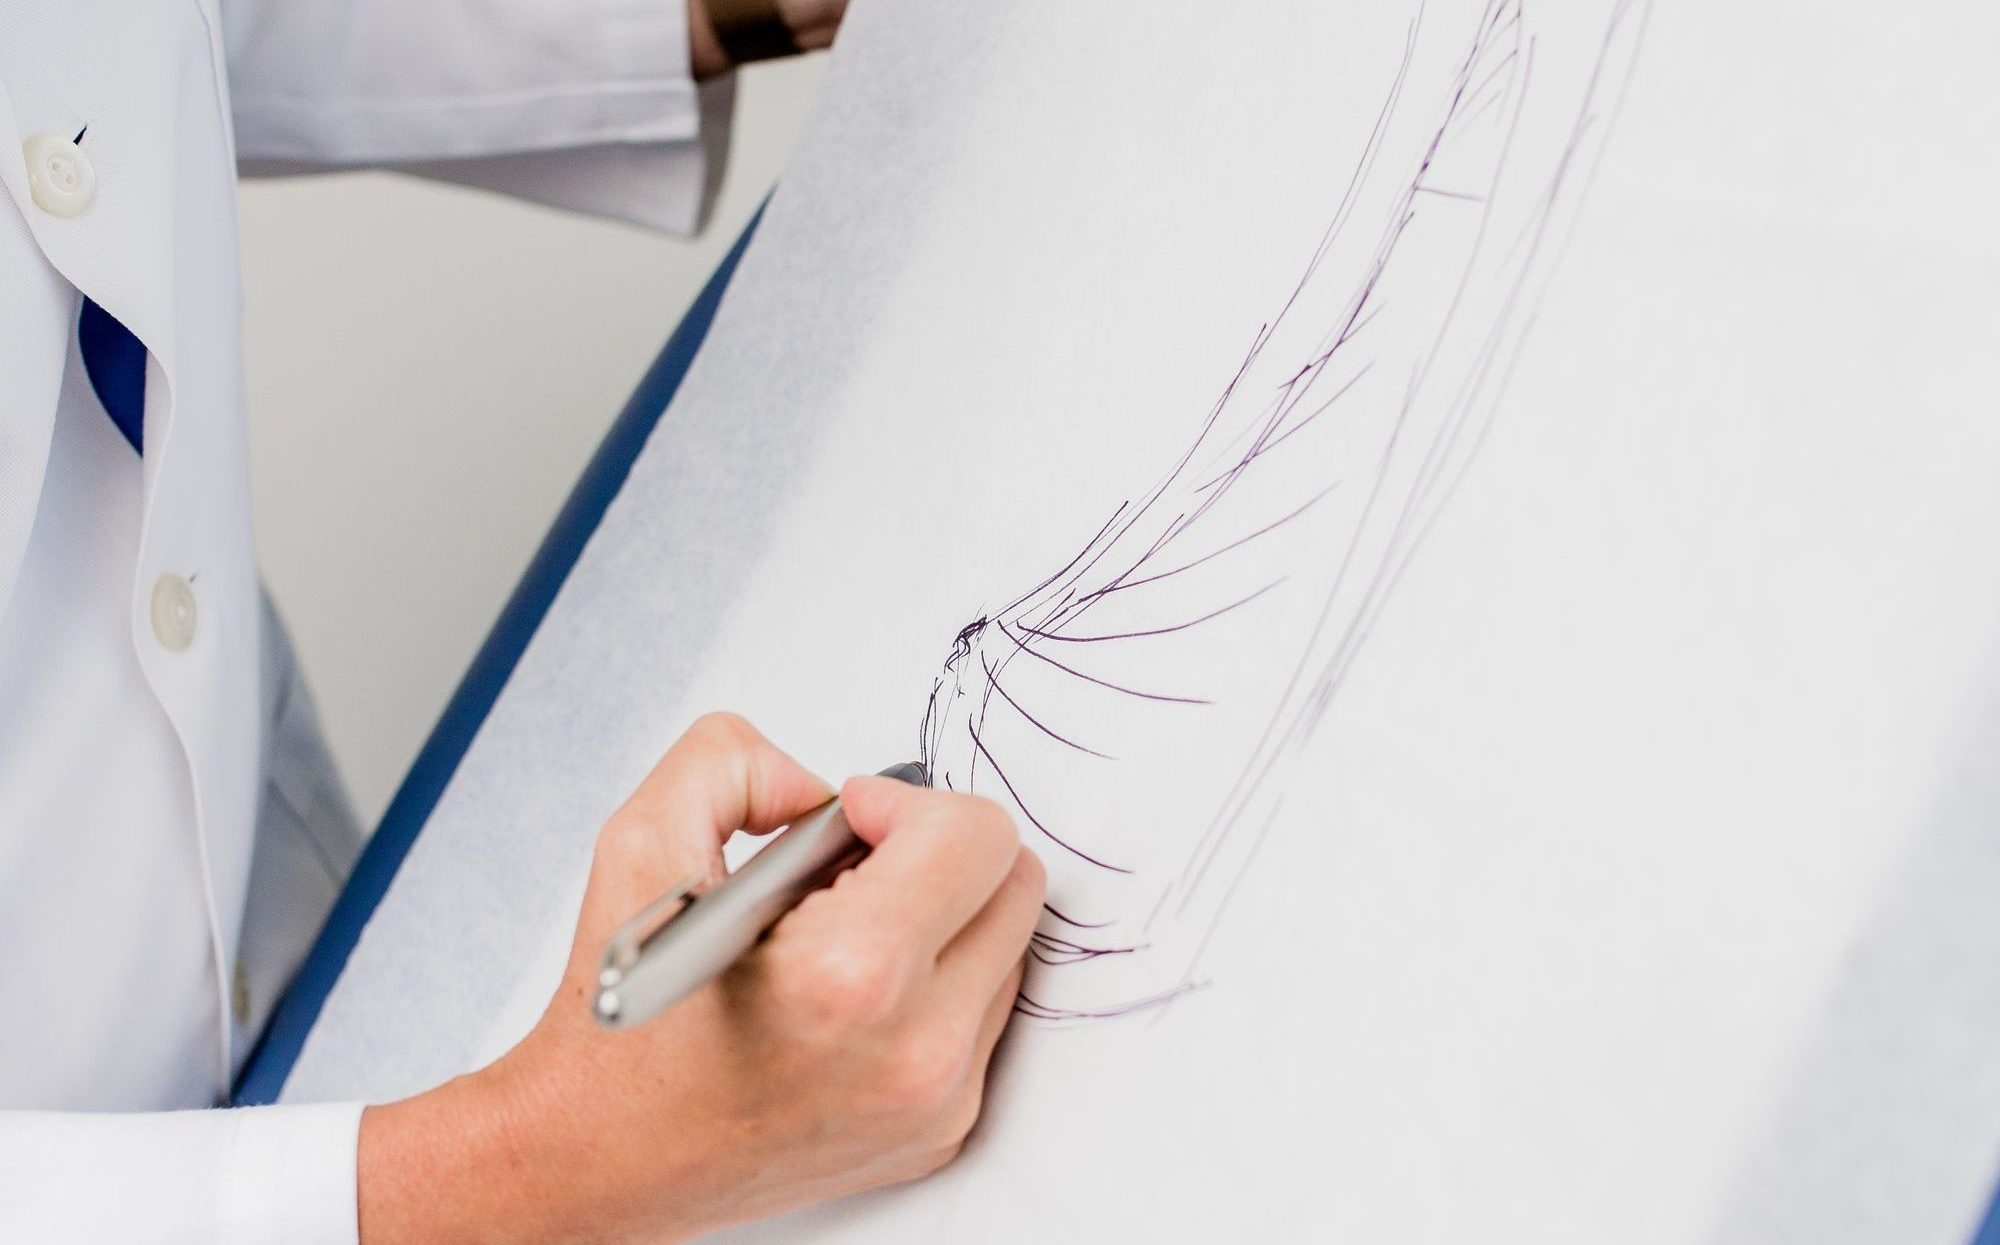 Dr. Spiegel Sketching a Breast